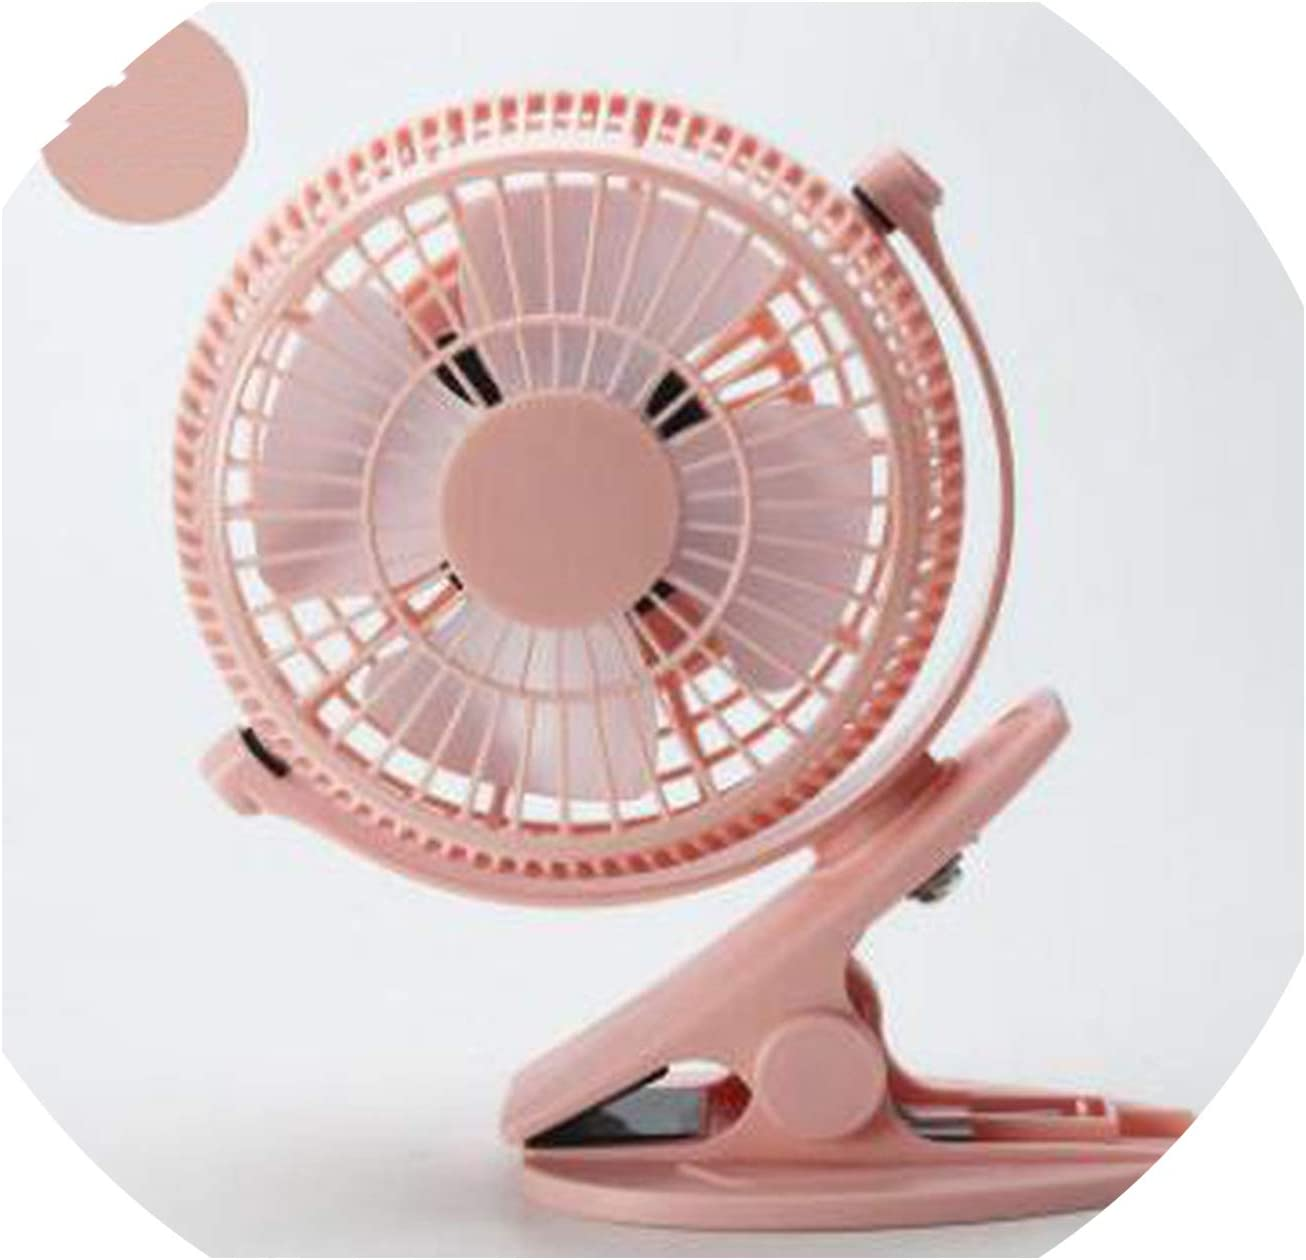 Portable Mini USB Fan Desk ABS Electric Desktop Computer Table Fan Home Office Electric Fans Mini Ventilator for Office,Pink